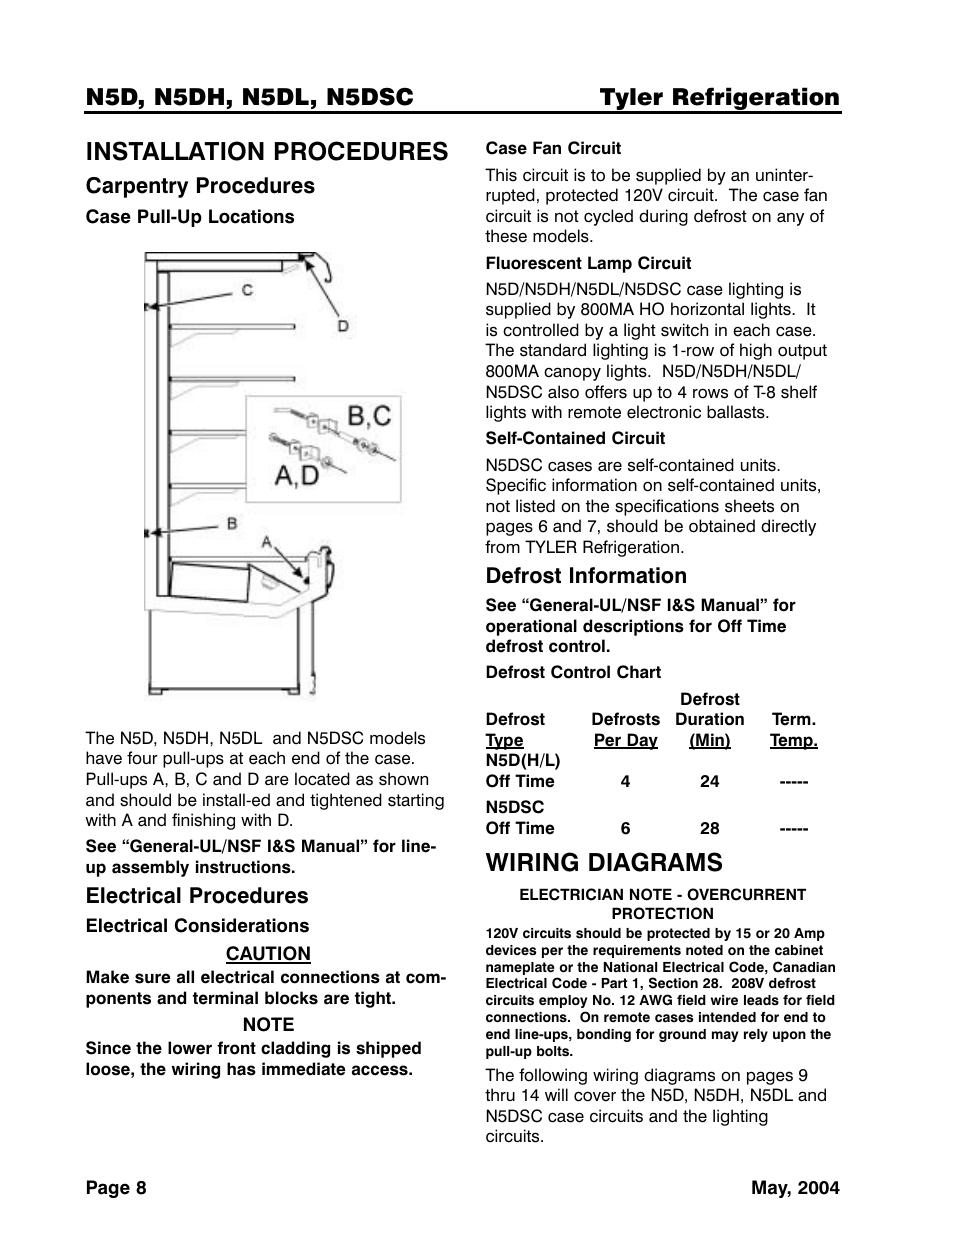 Tyler Refrigeration Wiring Diagrams - Cub Cadet 800 Wiring Diagram for Wiring  Diagram SchematicsWiring Diagram Schematics